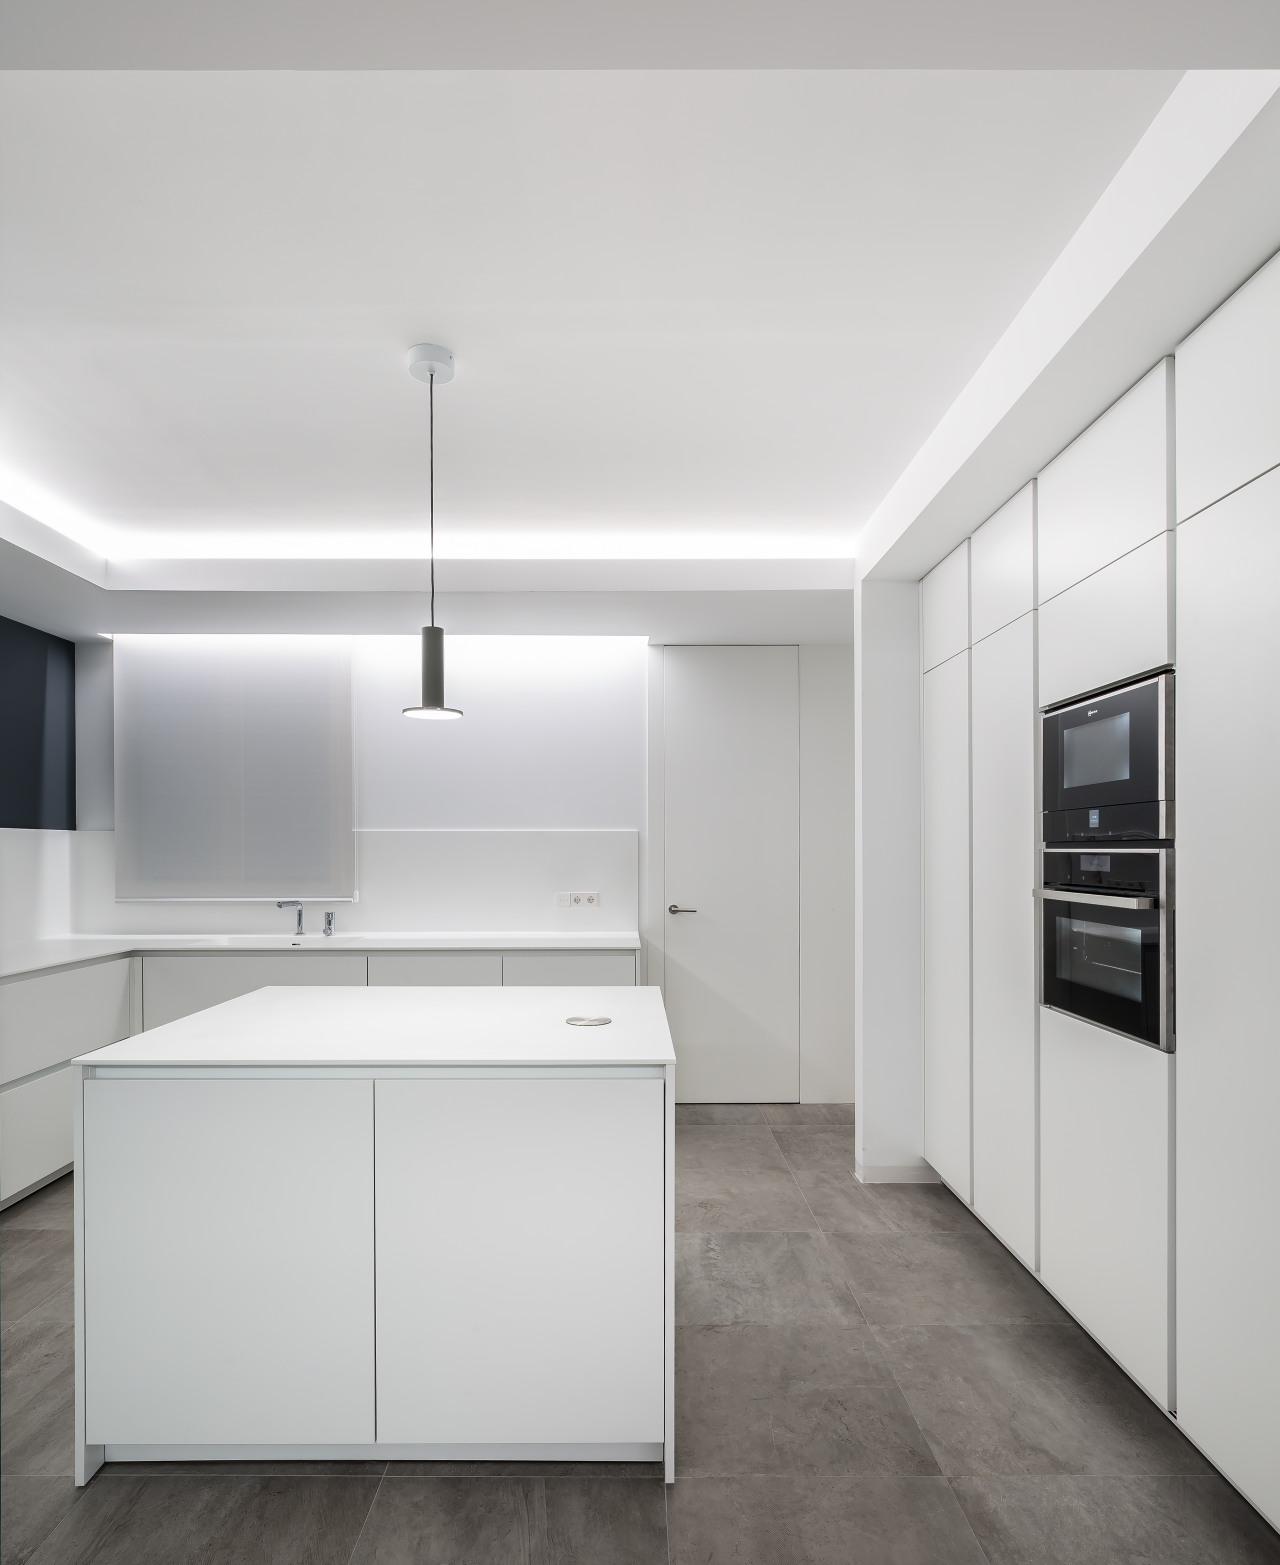 fotografia-arquitectura-interiorismo-valencia-german-cabo-gallardo-llopis-bfm-edificatoria-turia02 (9)